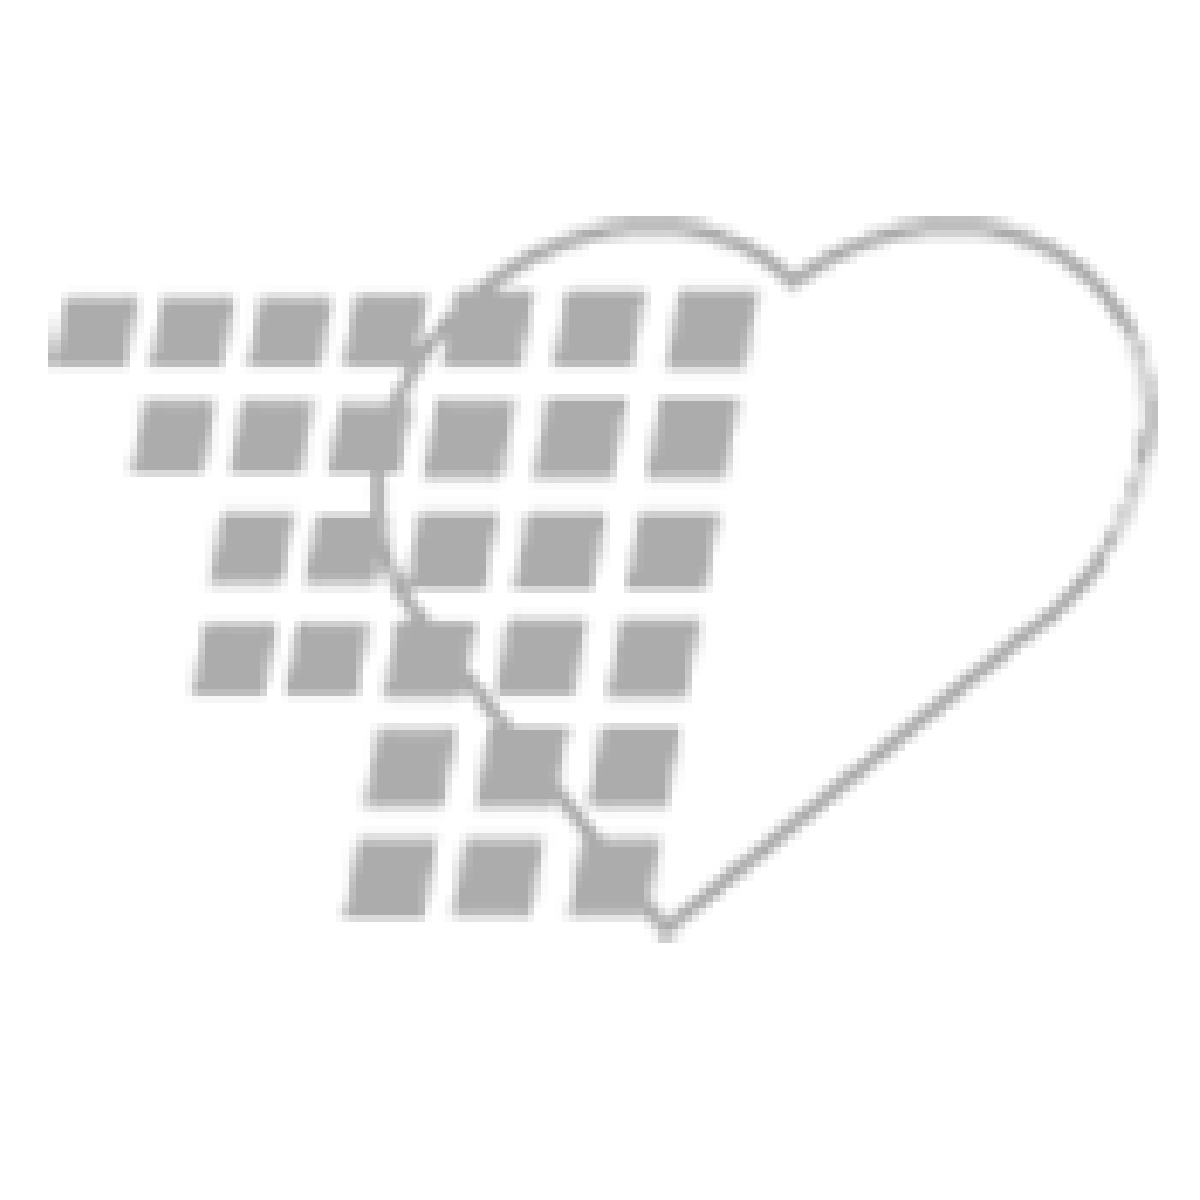 02-44-2019 - Zoll® SurePower Defibrillator Battery System